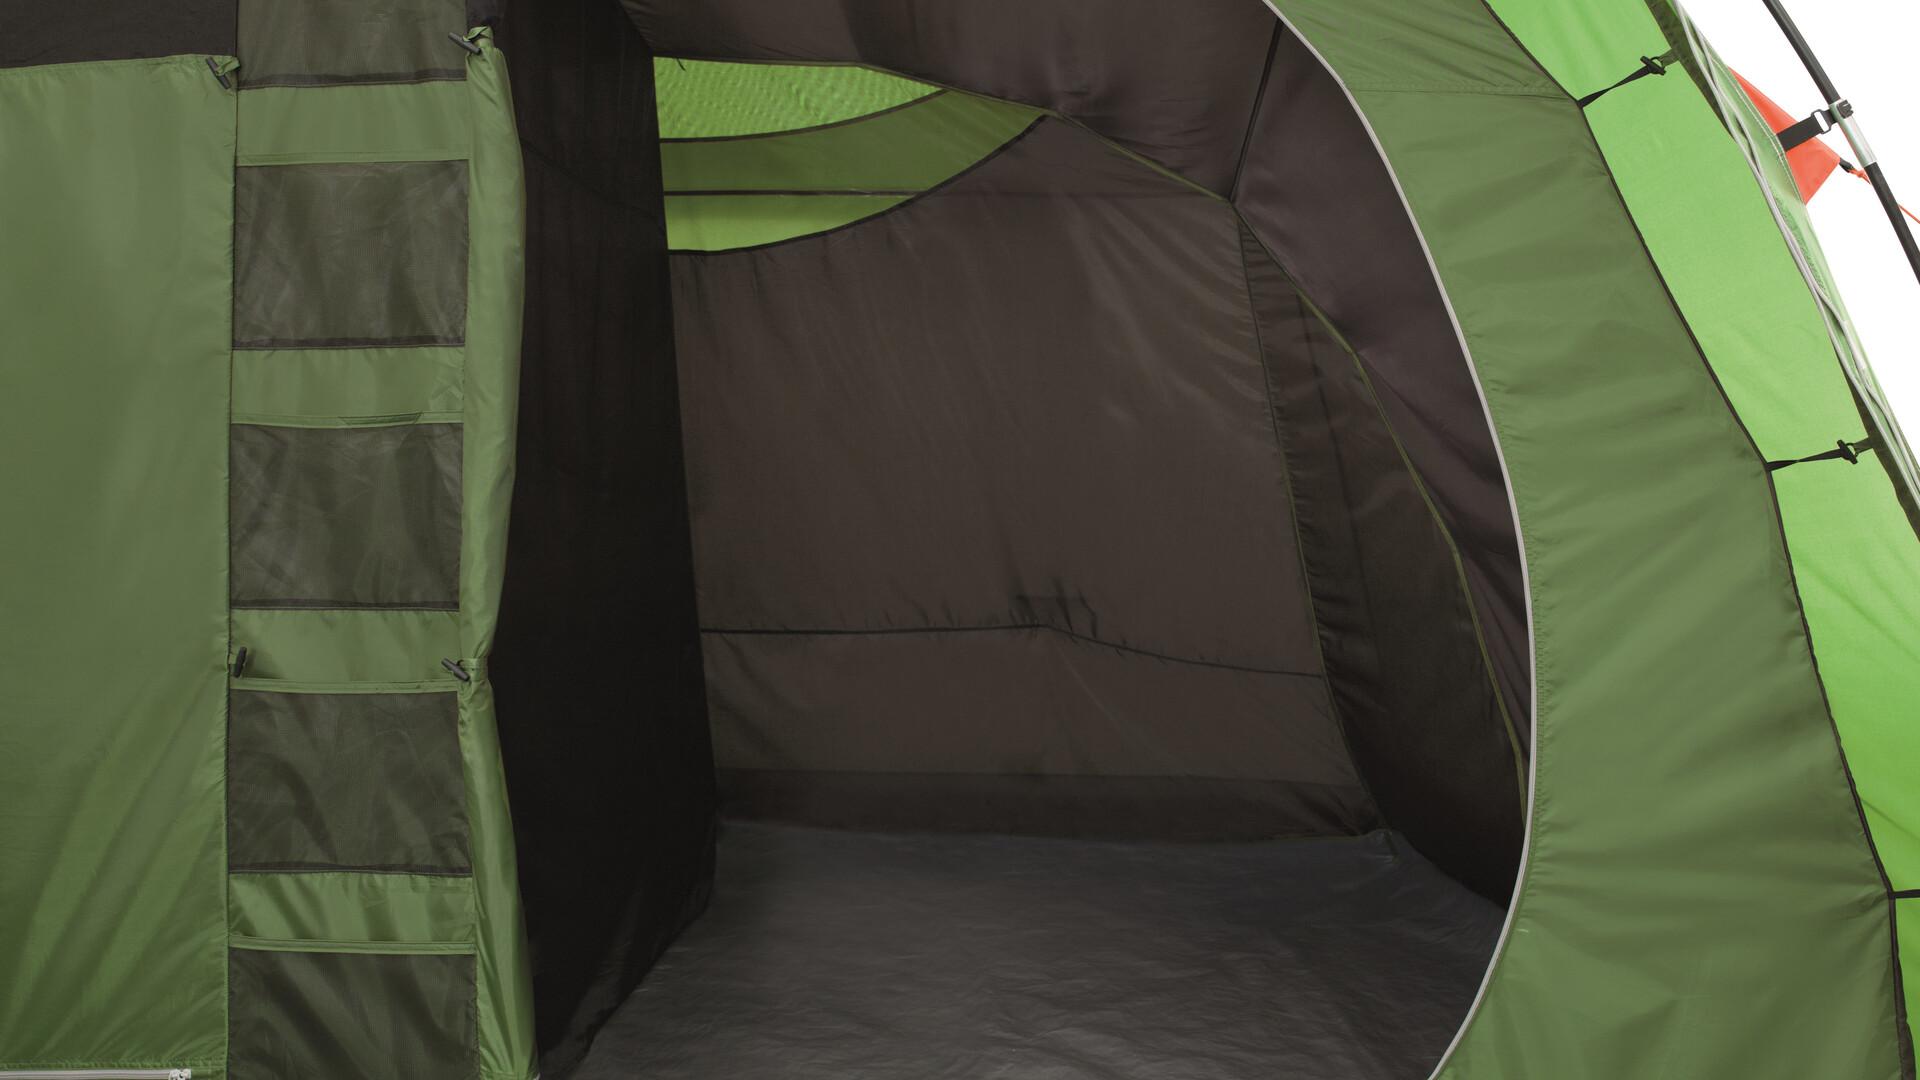 Easy Camp Palmdale 600 Tent greenlight grey | Gode tilbud